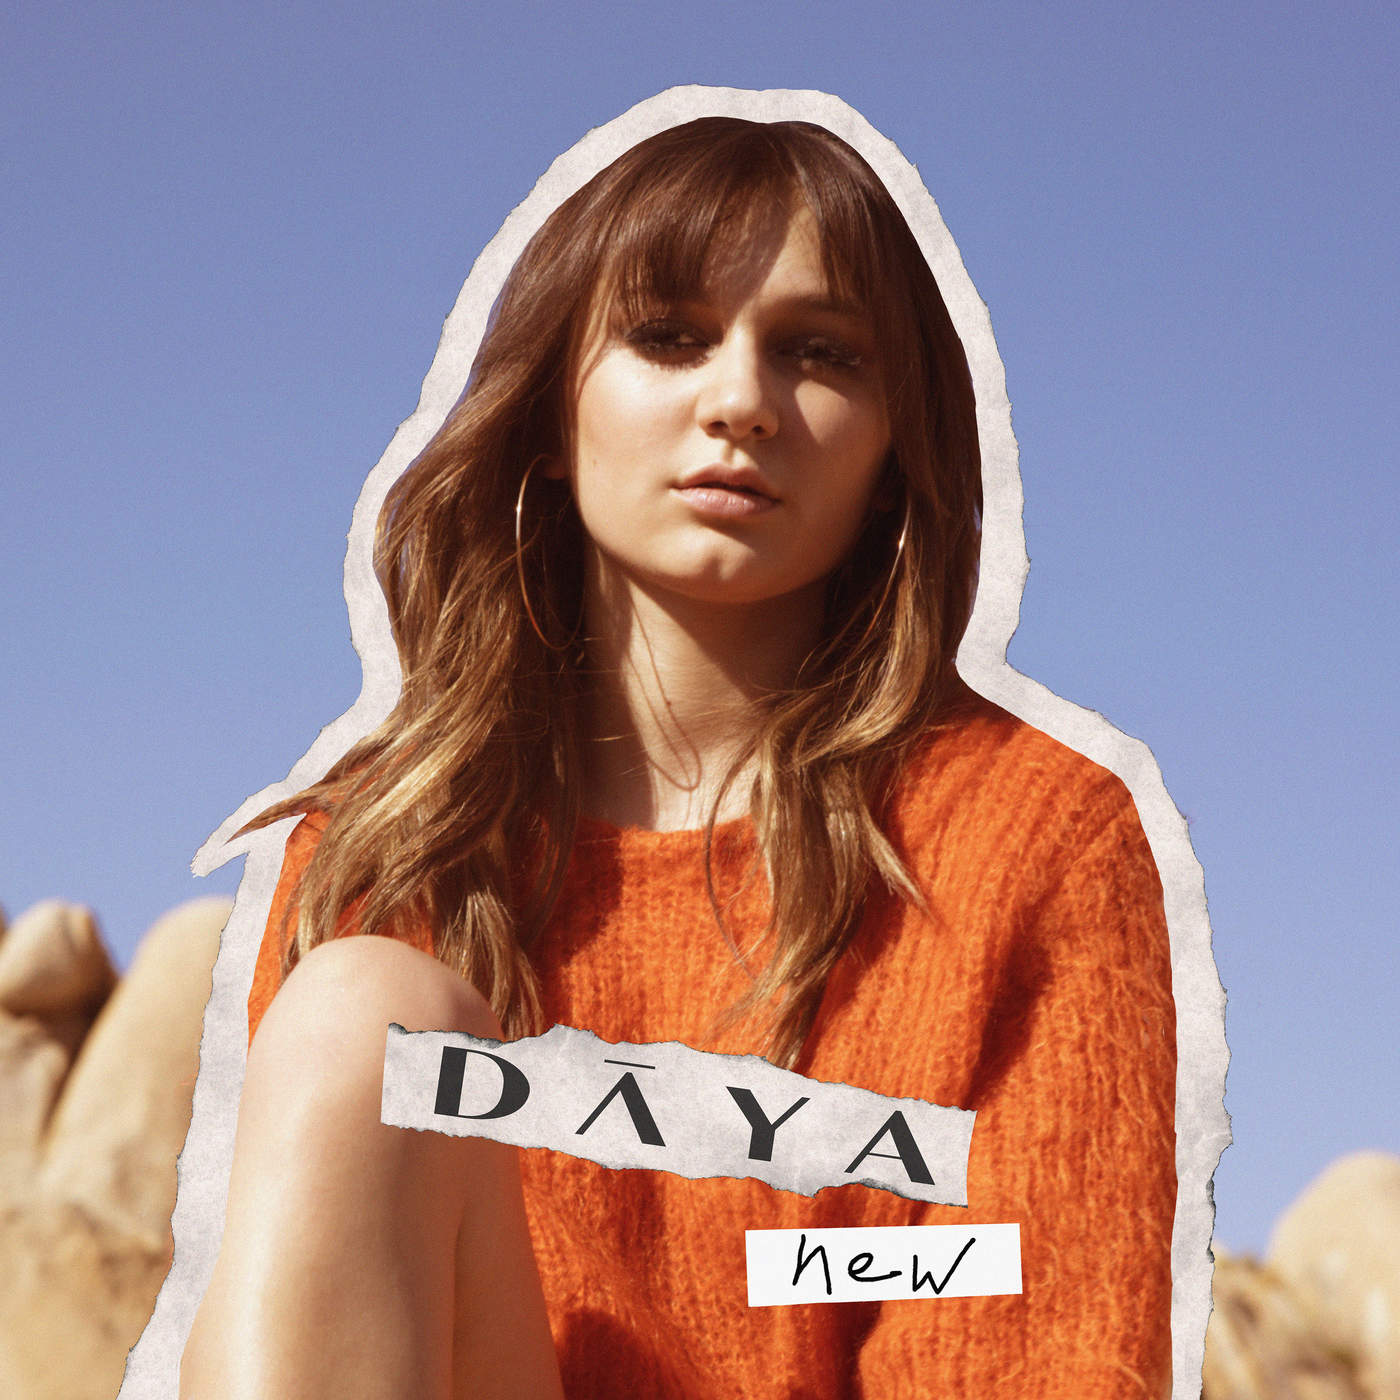 Daya - New - Single